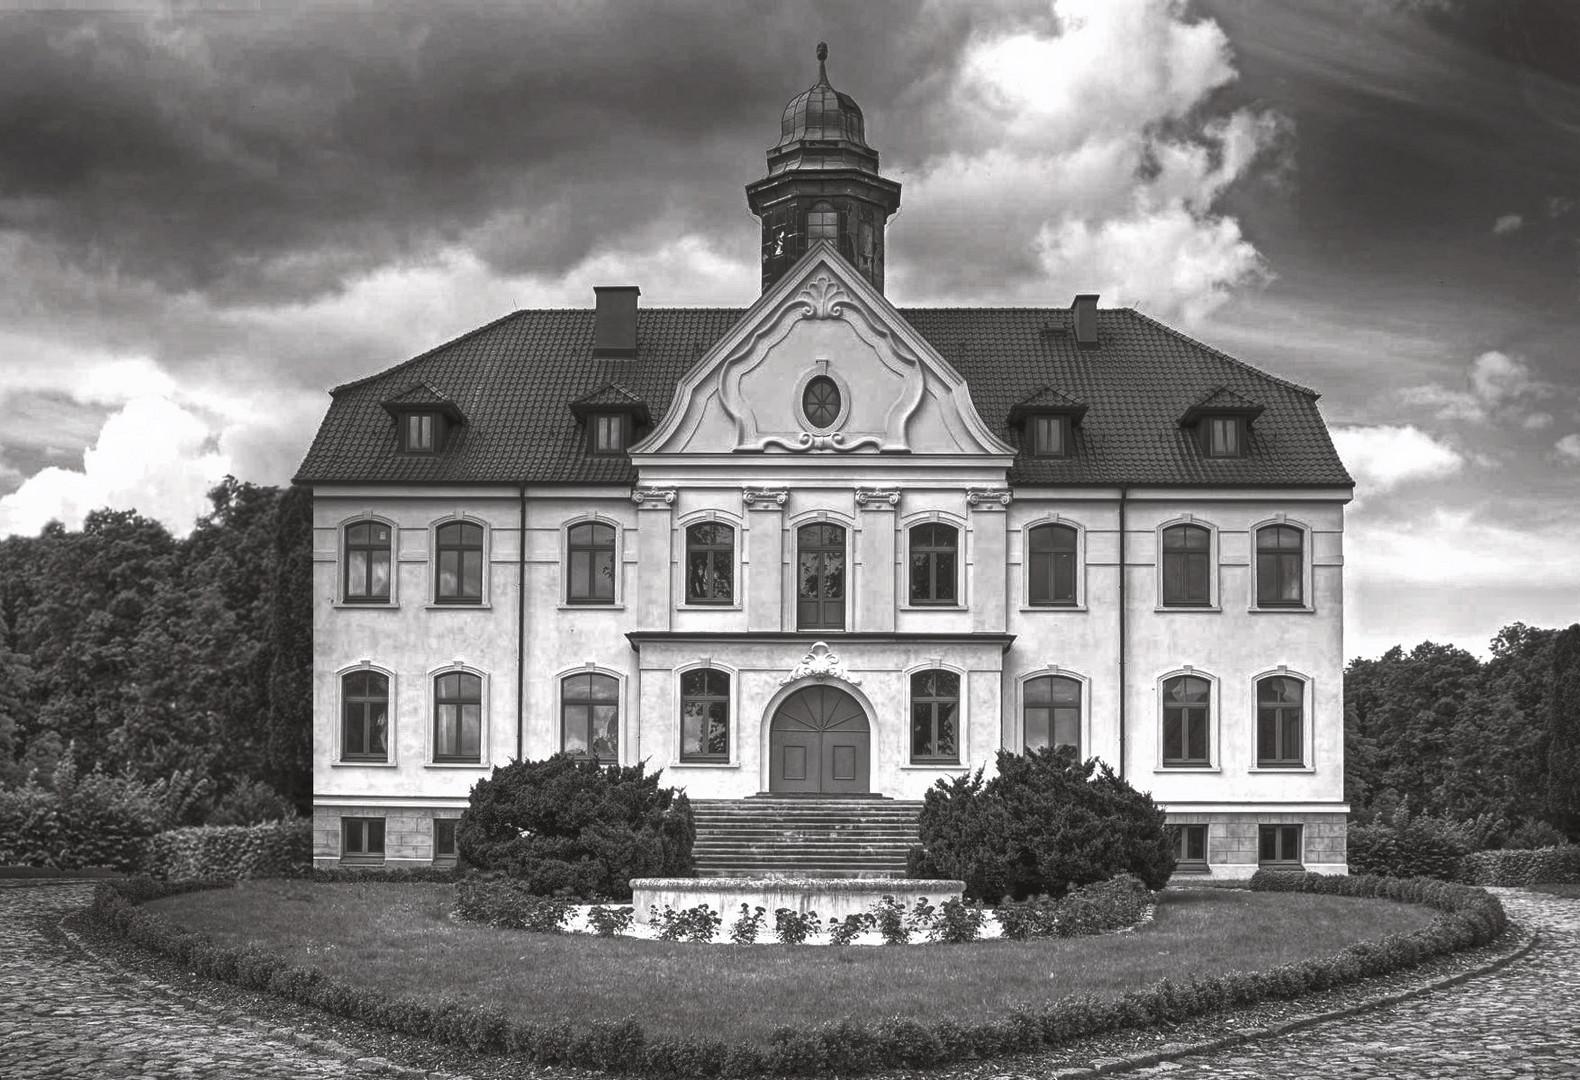 Altes Gutshaus in Mecklenburg